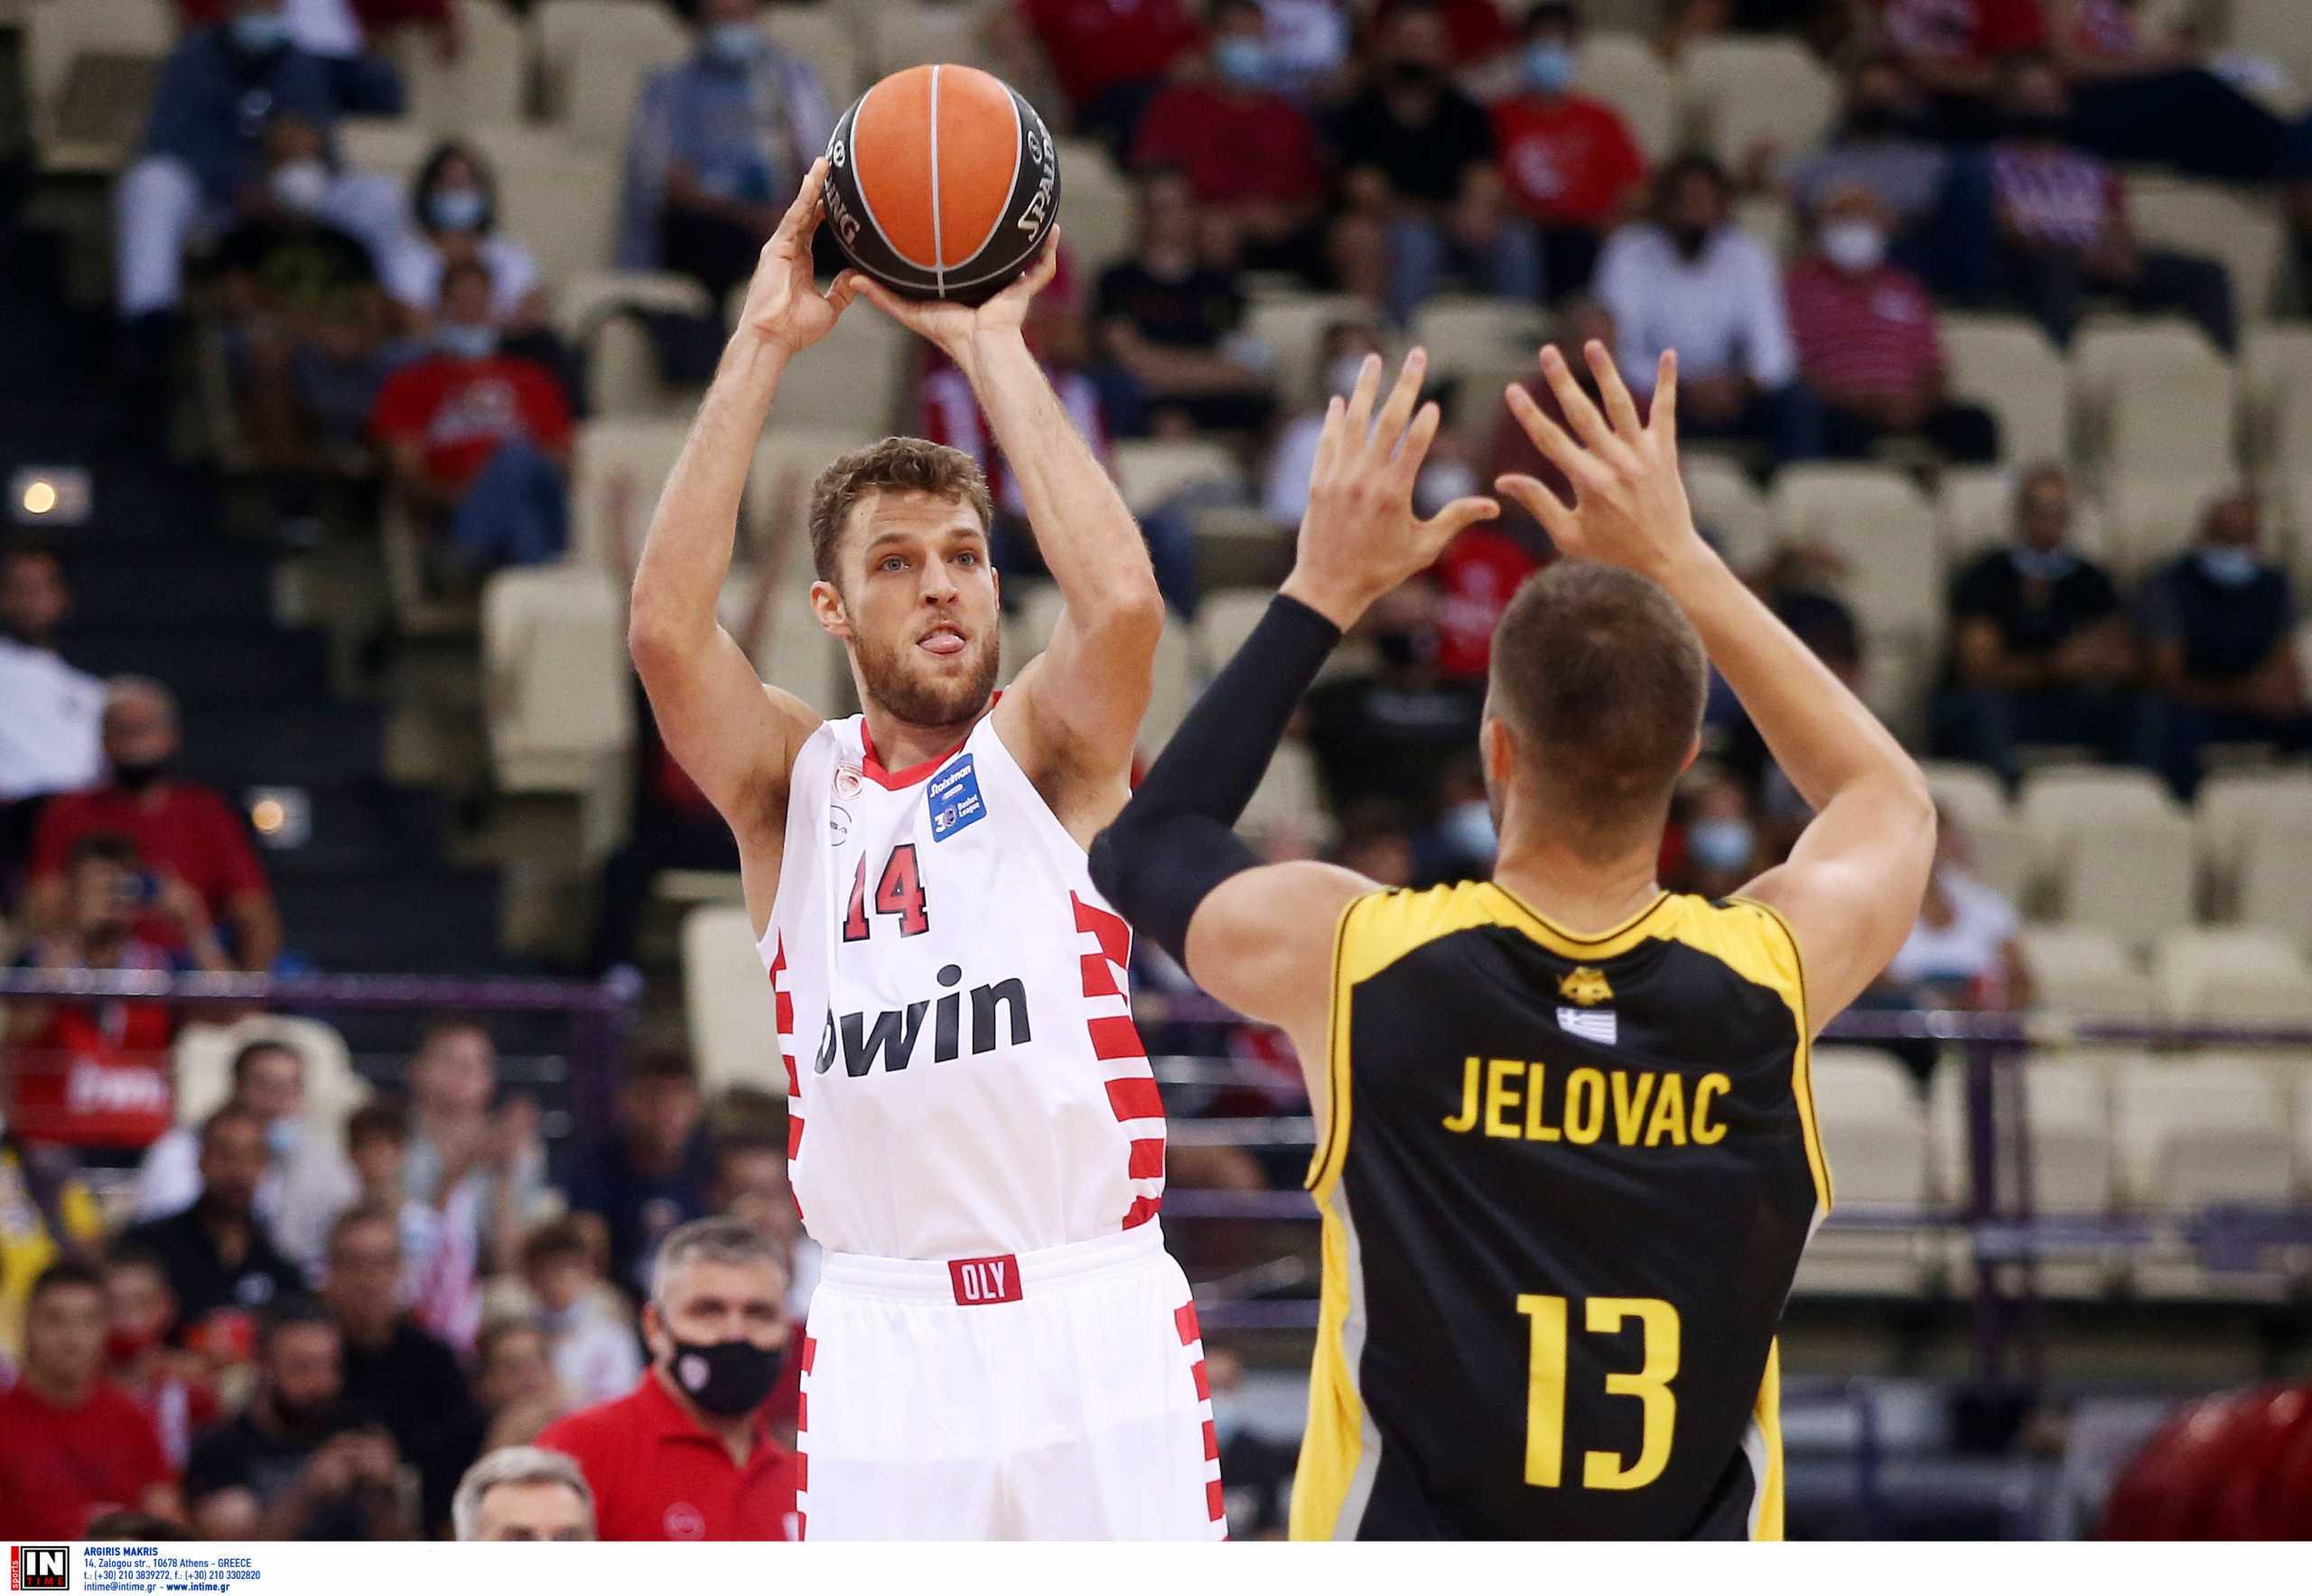 Basket League, Ολυμπιακός – ΑΕΚ 103-78: Σαρωτική πρεμιέρα με διαστημικό Βεζένκοφ